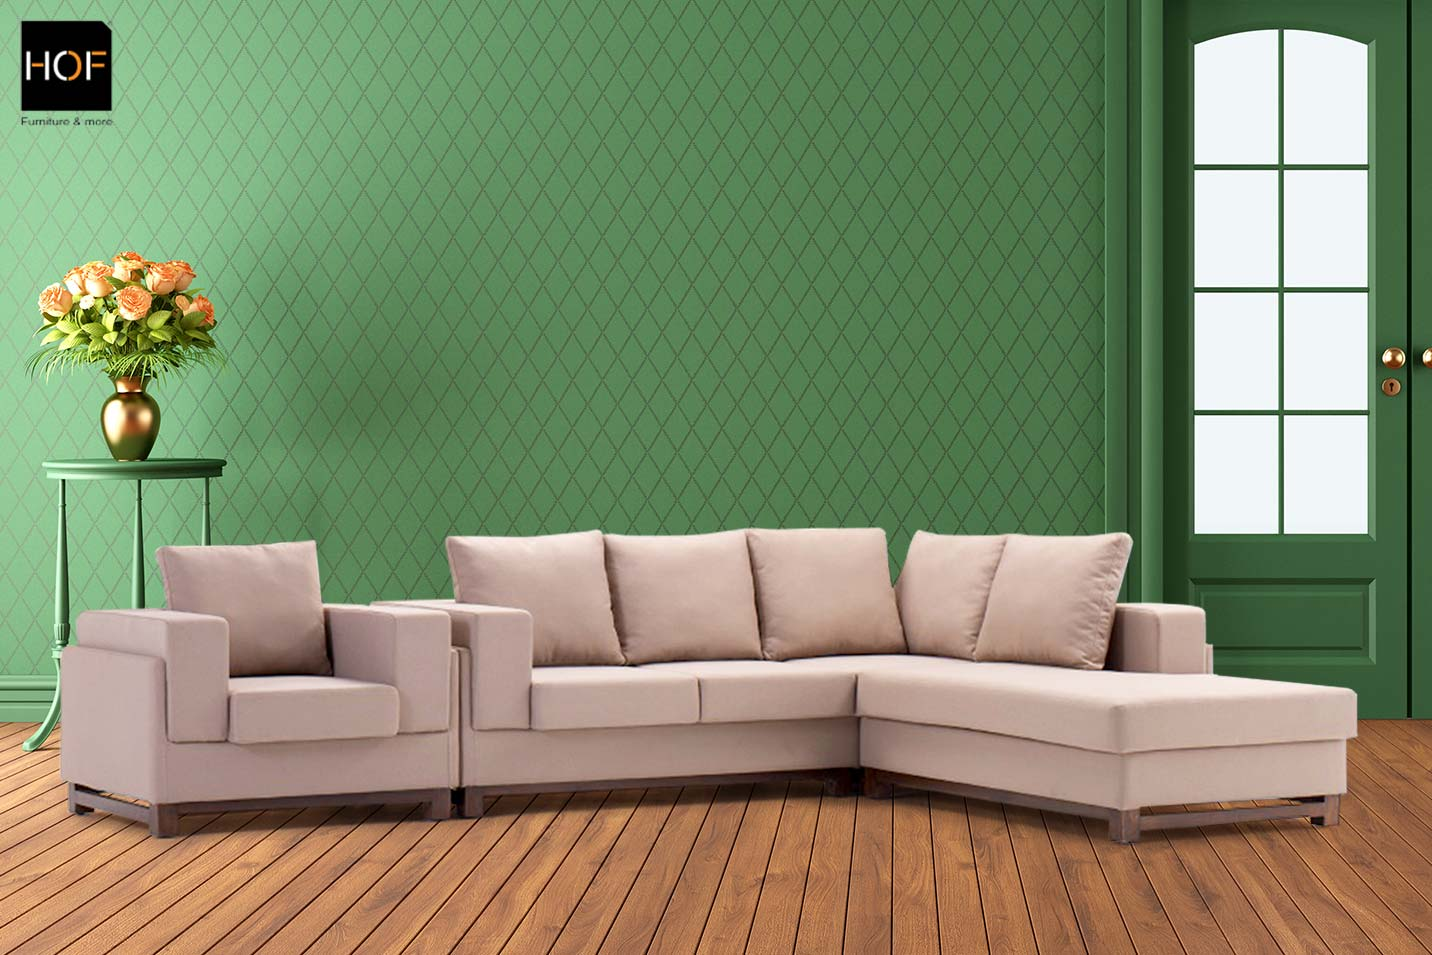 dania corbin sofa refil sofa. Black Bedroom Furniture Sets. Home Design Ideas